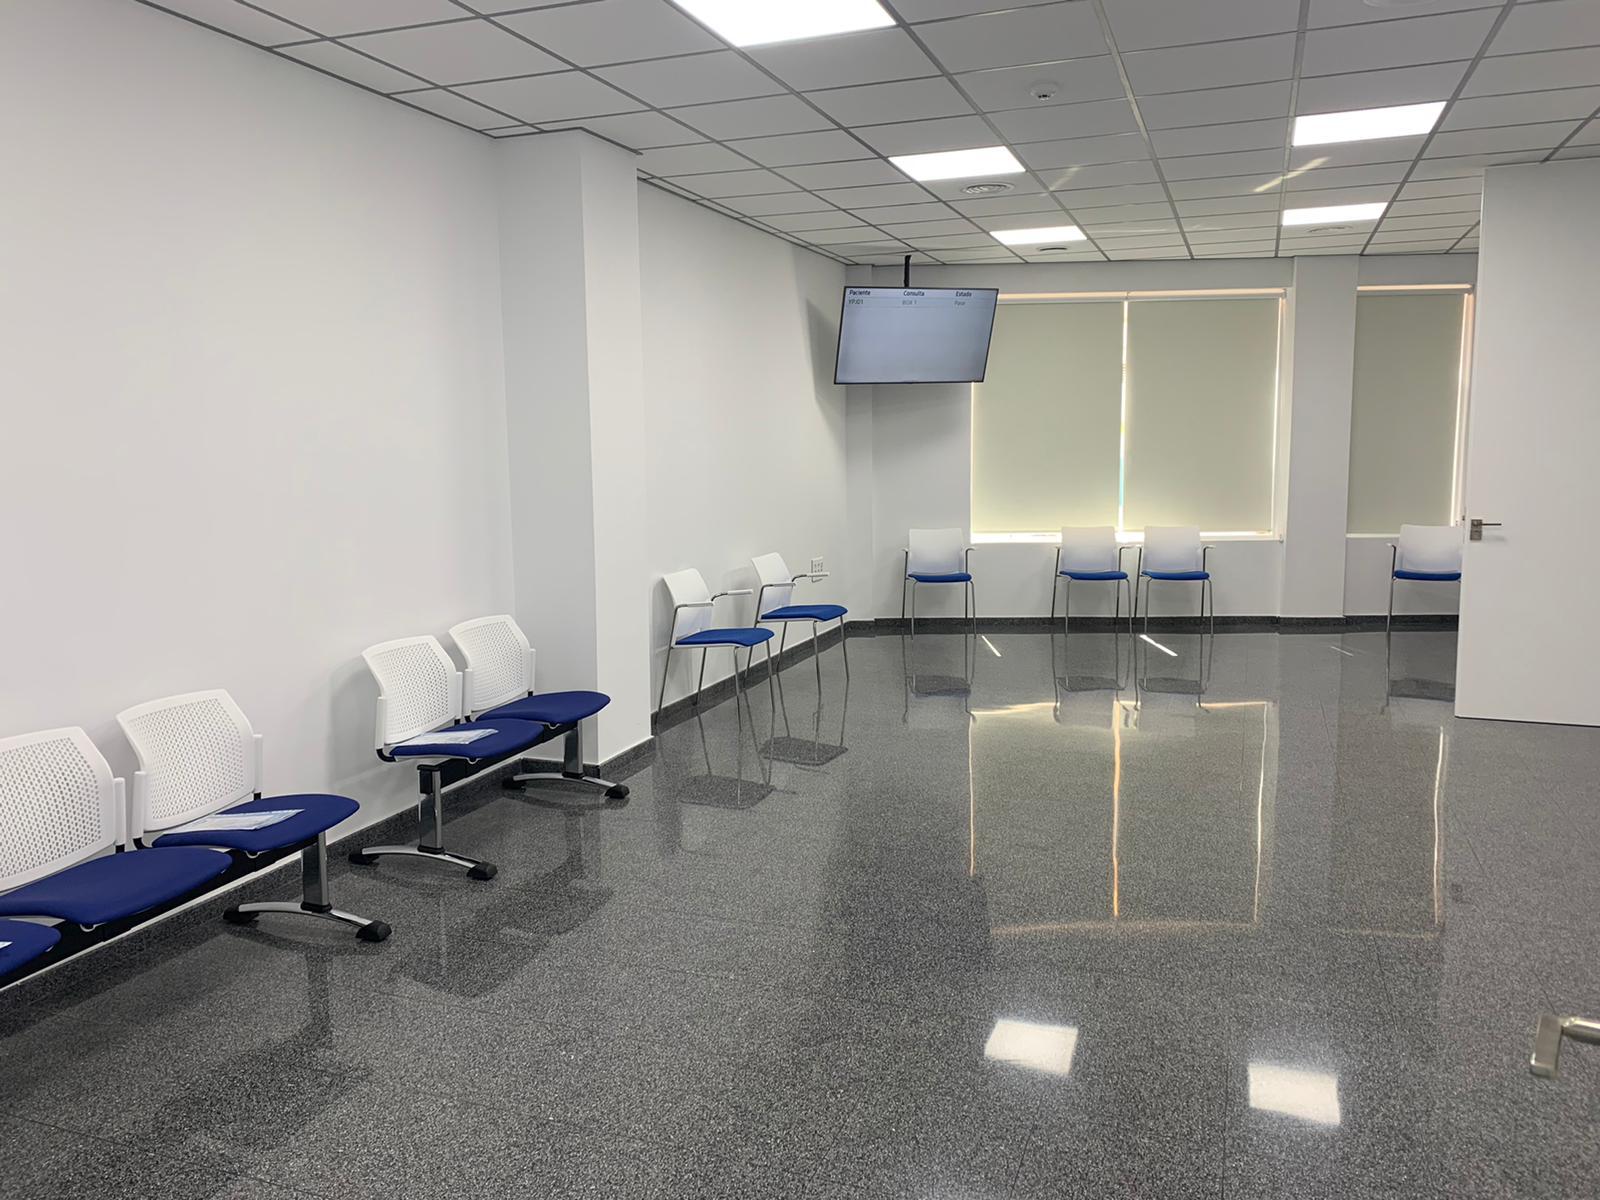 sala de espera hospital de día